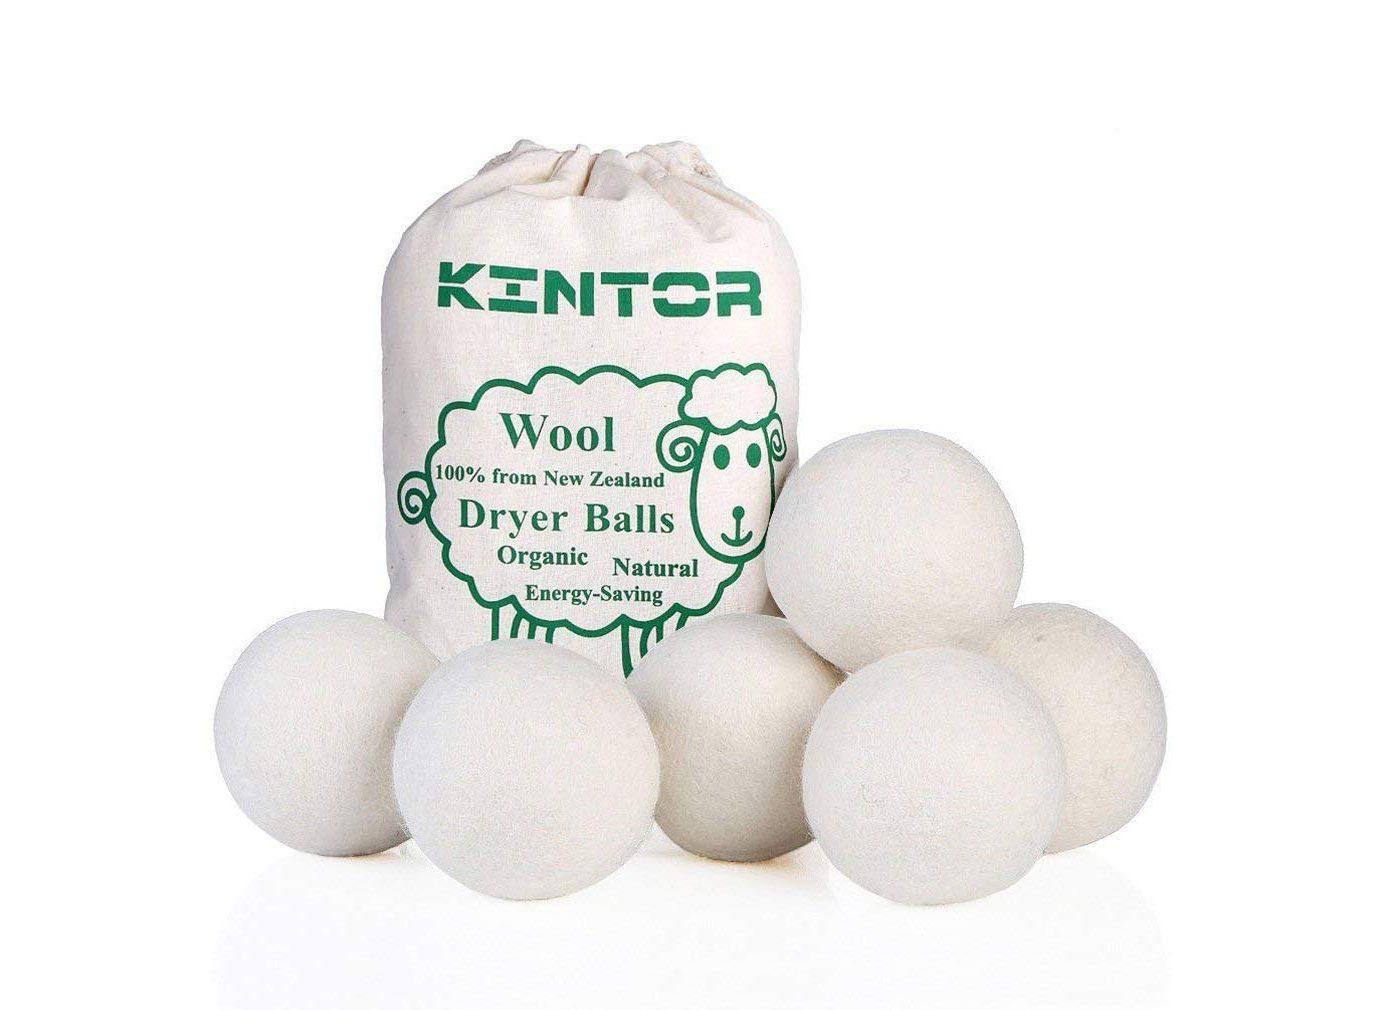 KINTOR Wool Dryer Balls